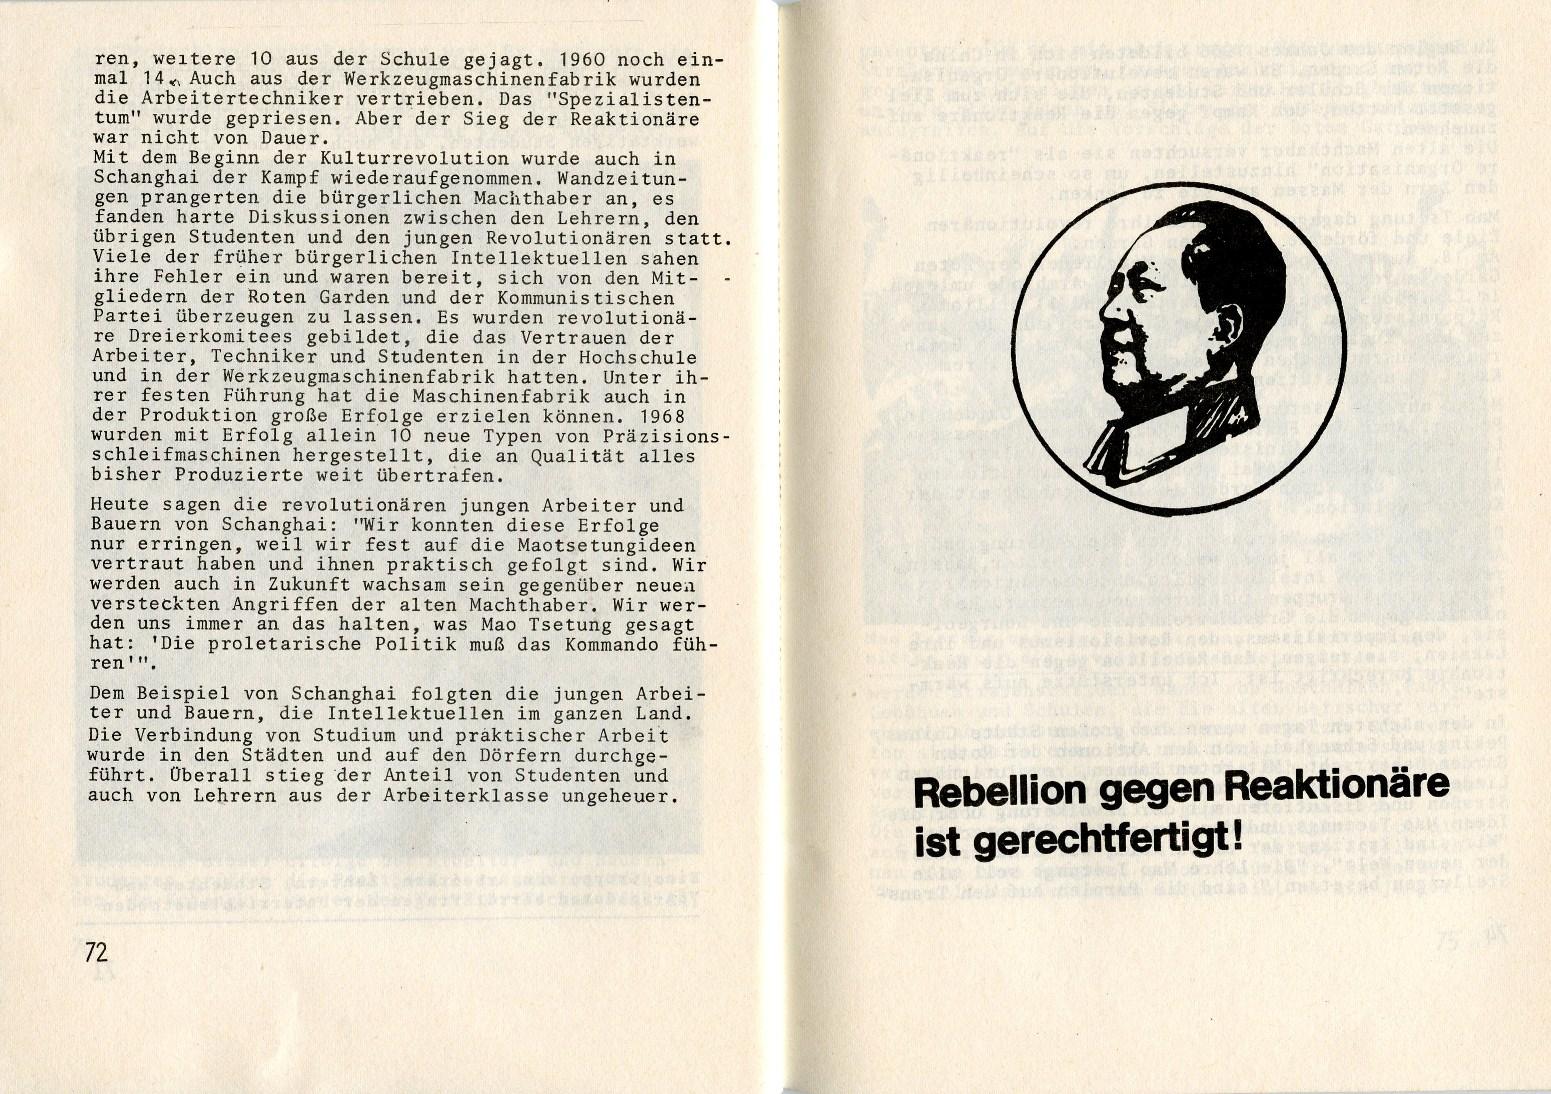 ZB_KPChinas_1971_38